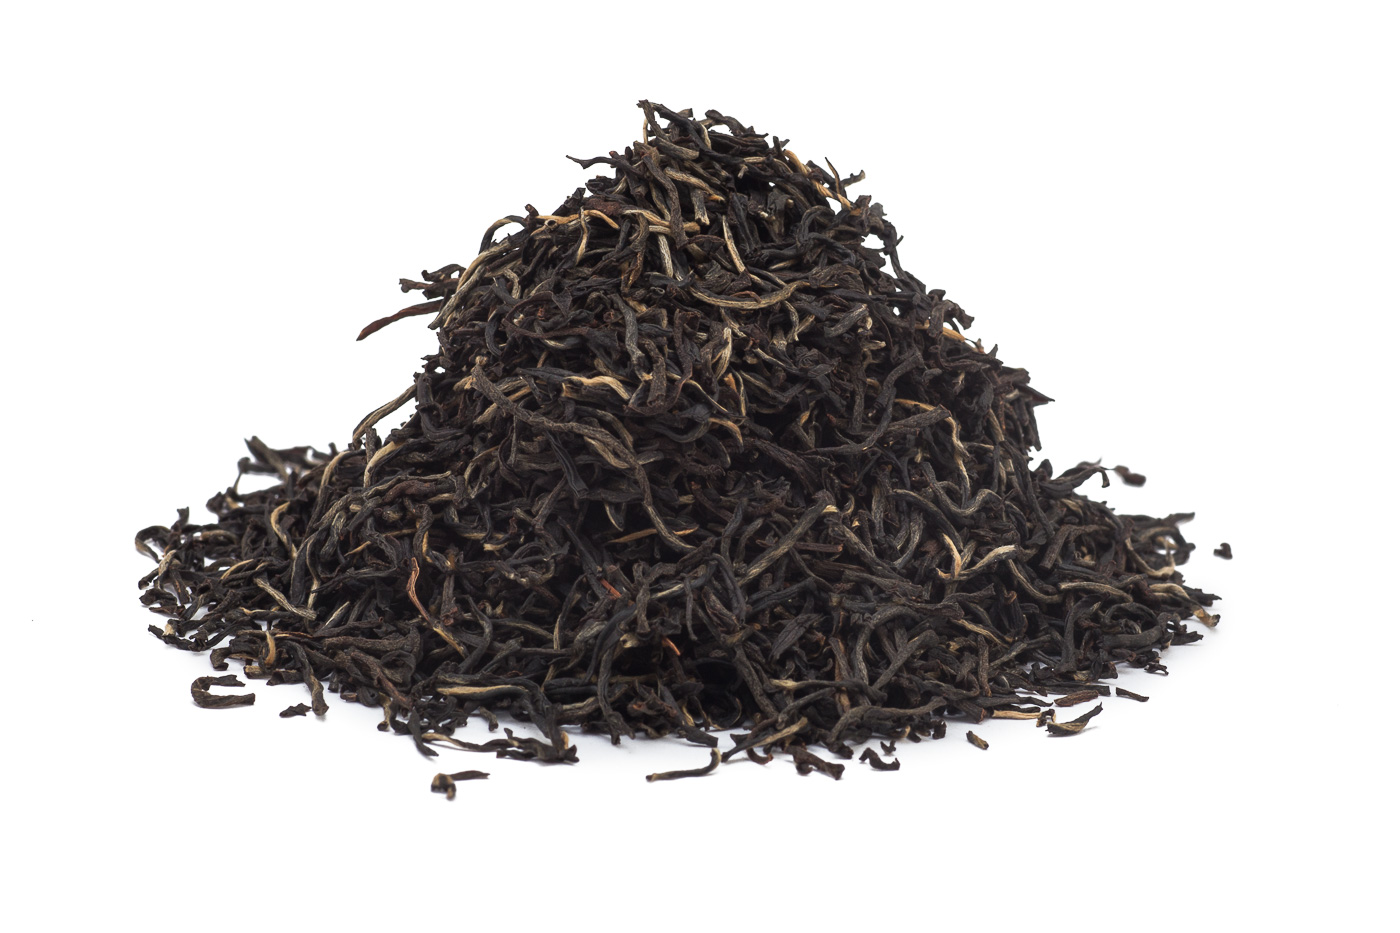 CEYLON FBOPFEXSP NEW VITHANAKANDE - čierny čaj, 1000g